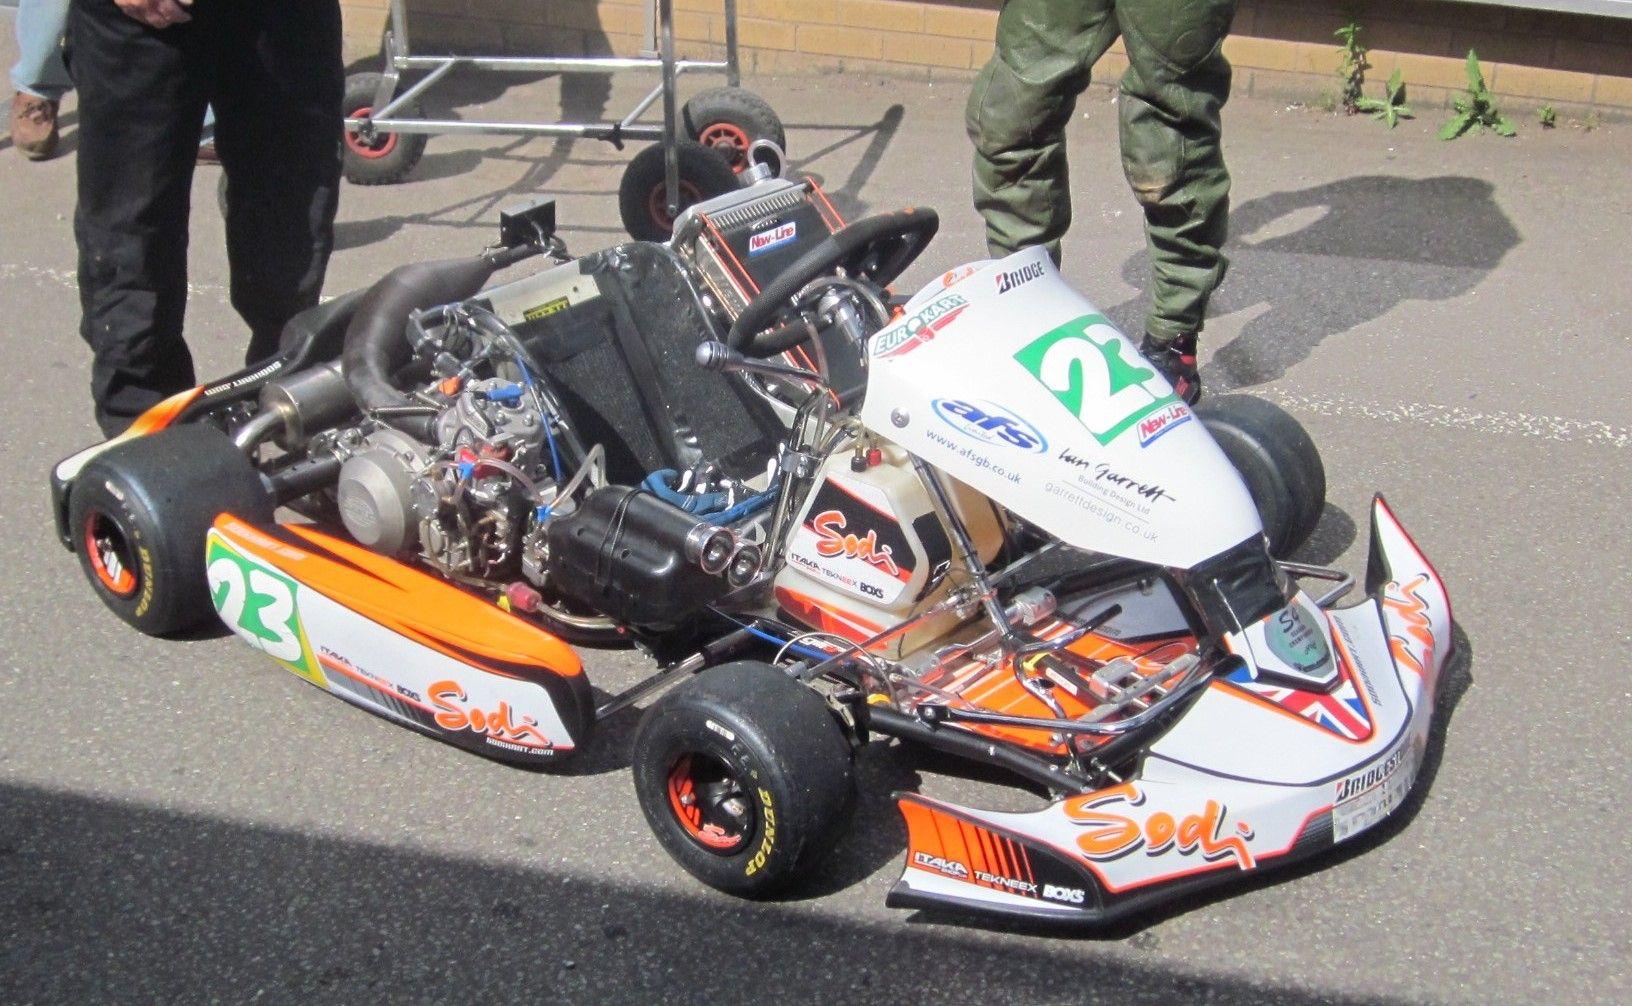 Sodi Eurokart/ Pavesi (Formula 125 KZ) | Other Superkarts | Racing